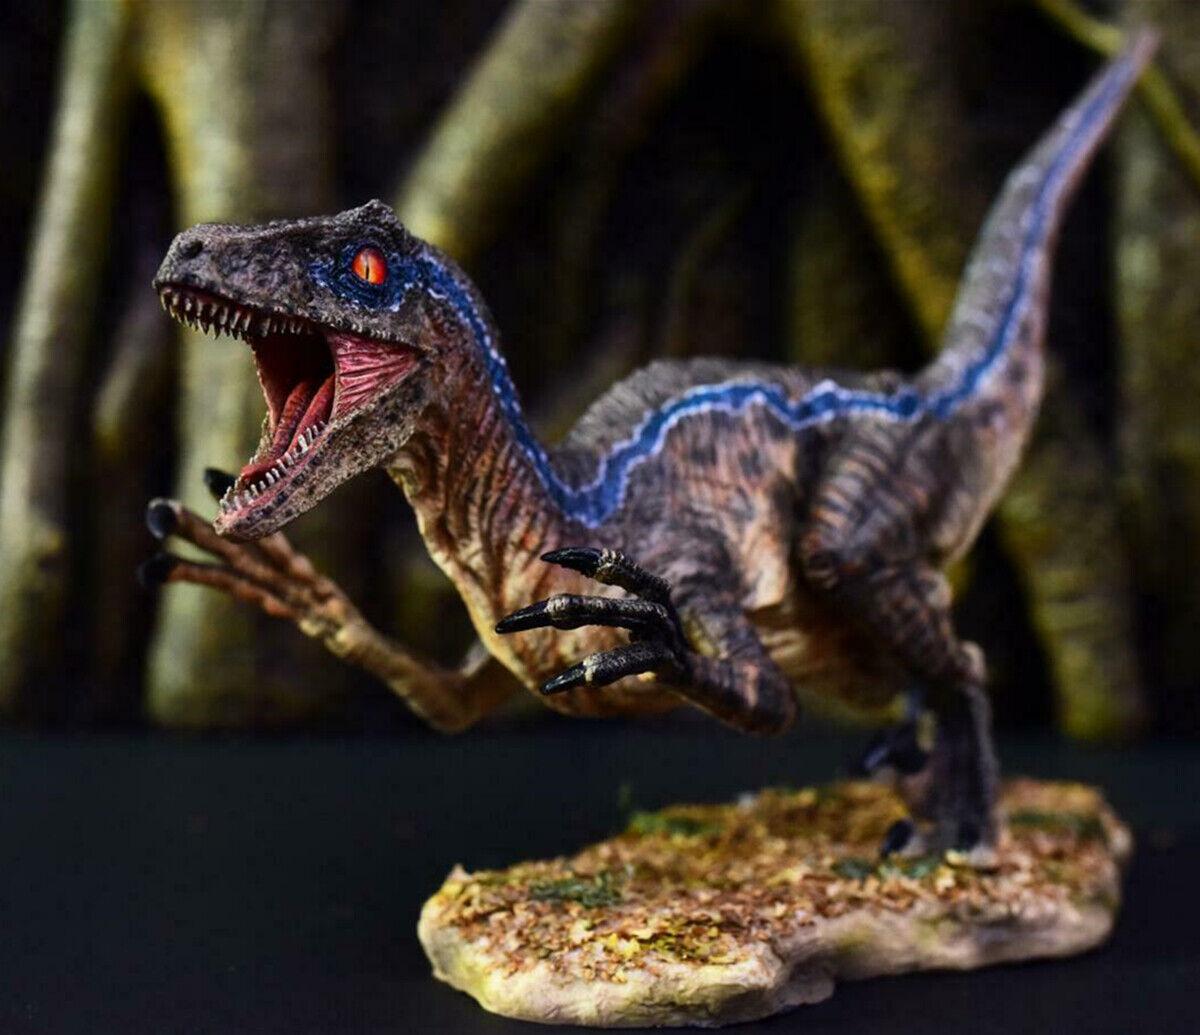 blu Velocraptor 1 10 Scene Pre Raptor Dinosaur modello Collector Decor Gift GK